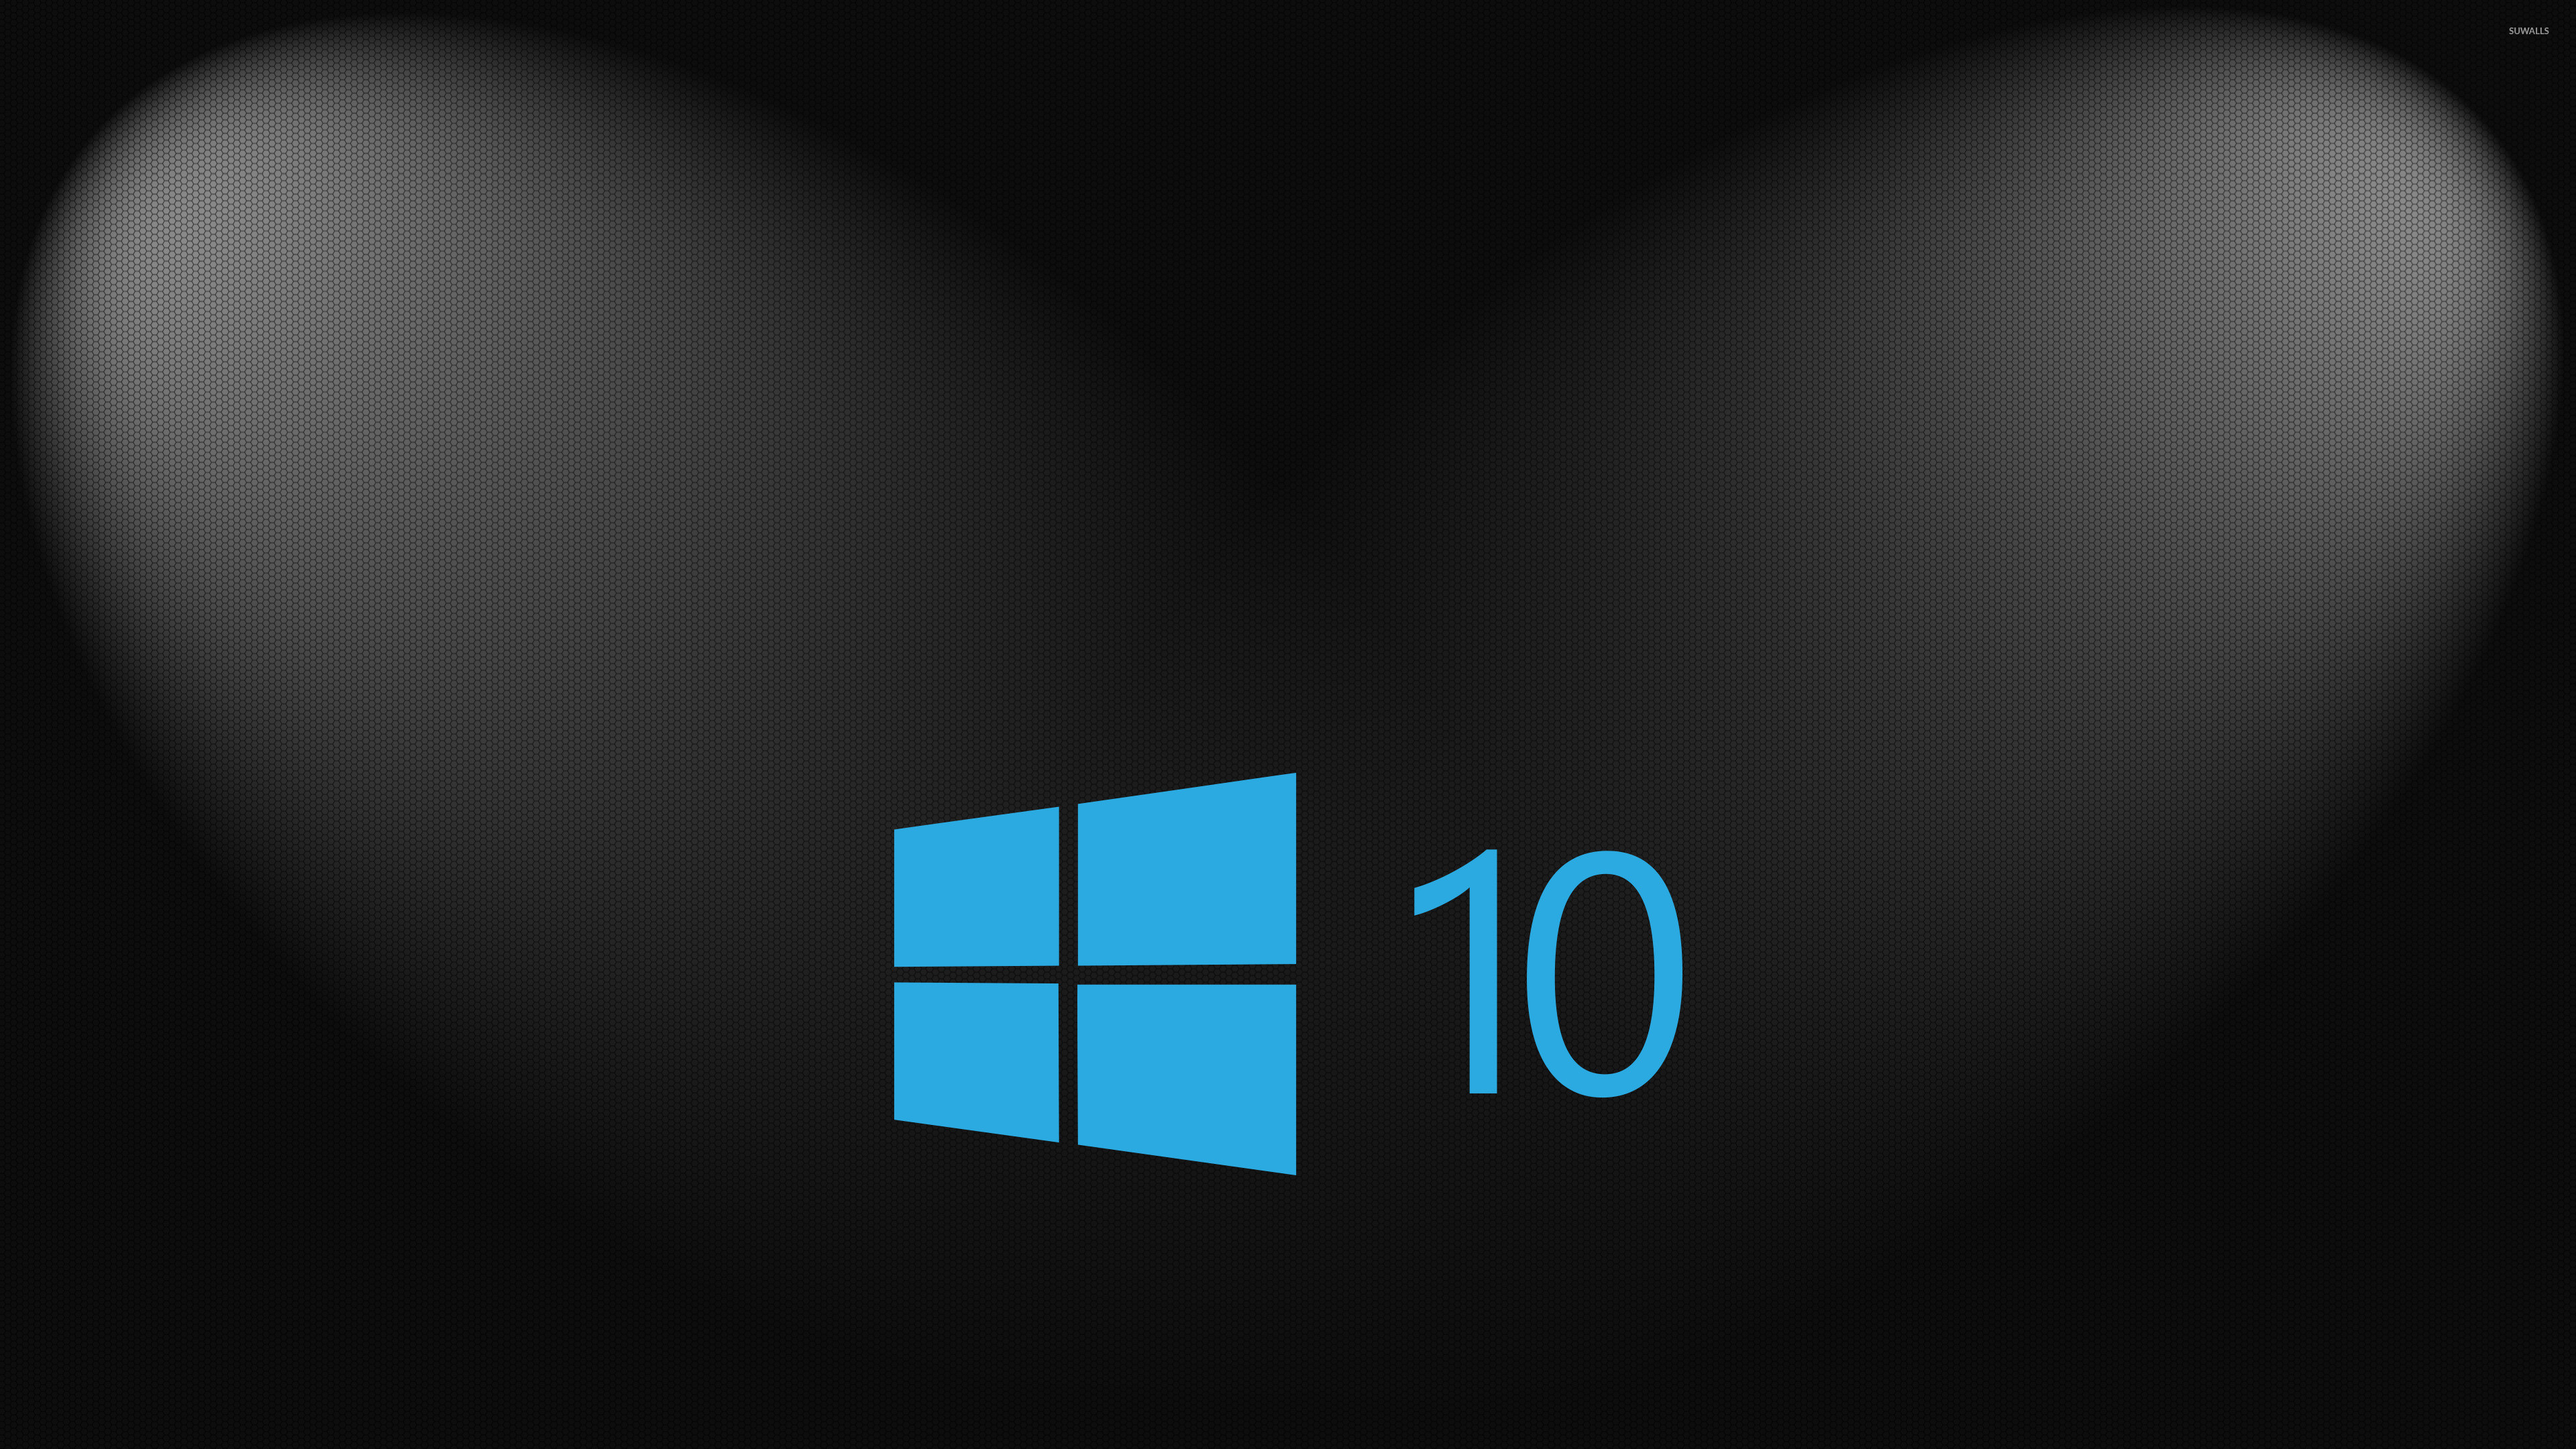 Res: 3840x2160, Windows 10 simple blue logo on hexagon pattern wallpaper